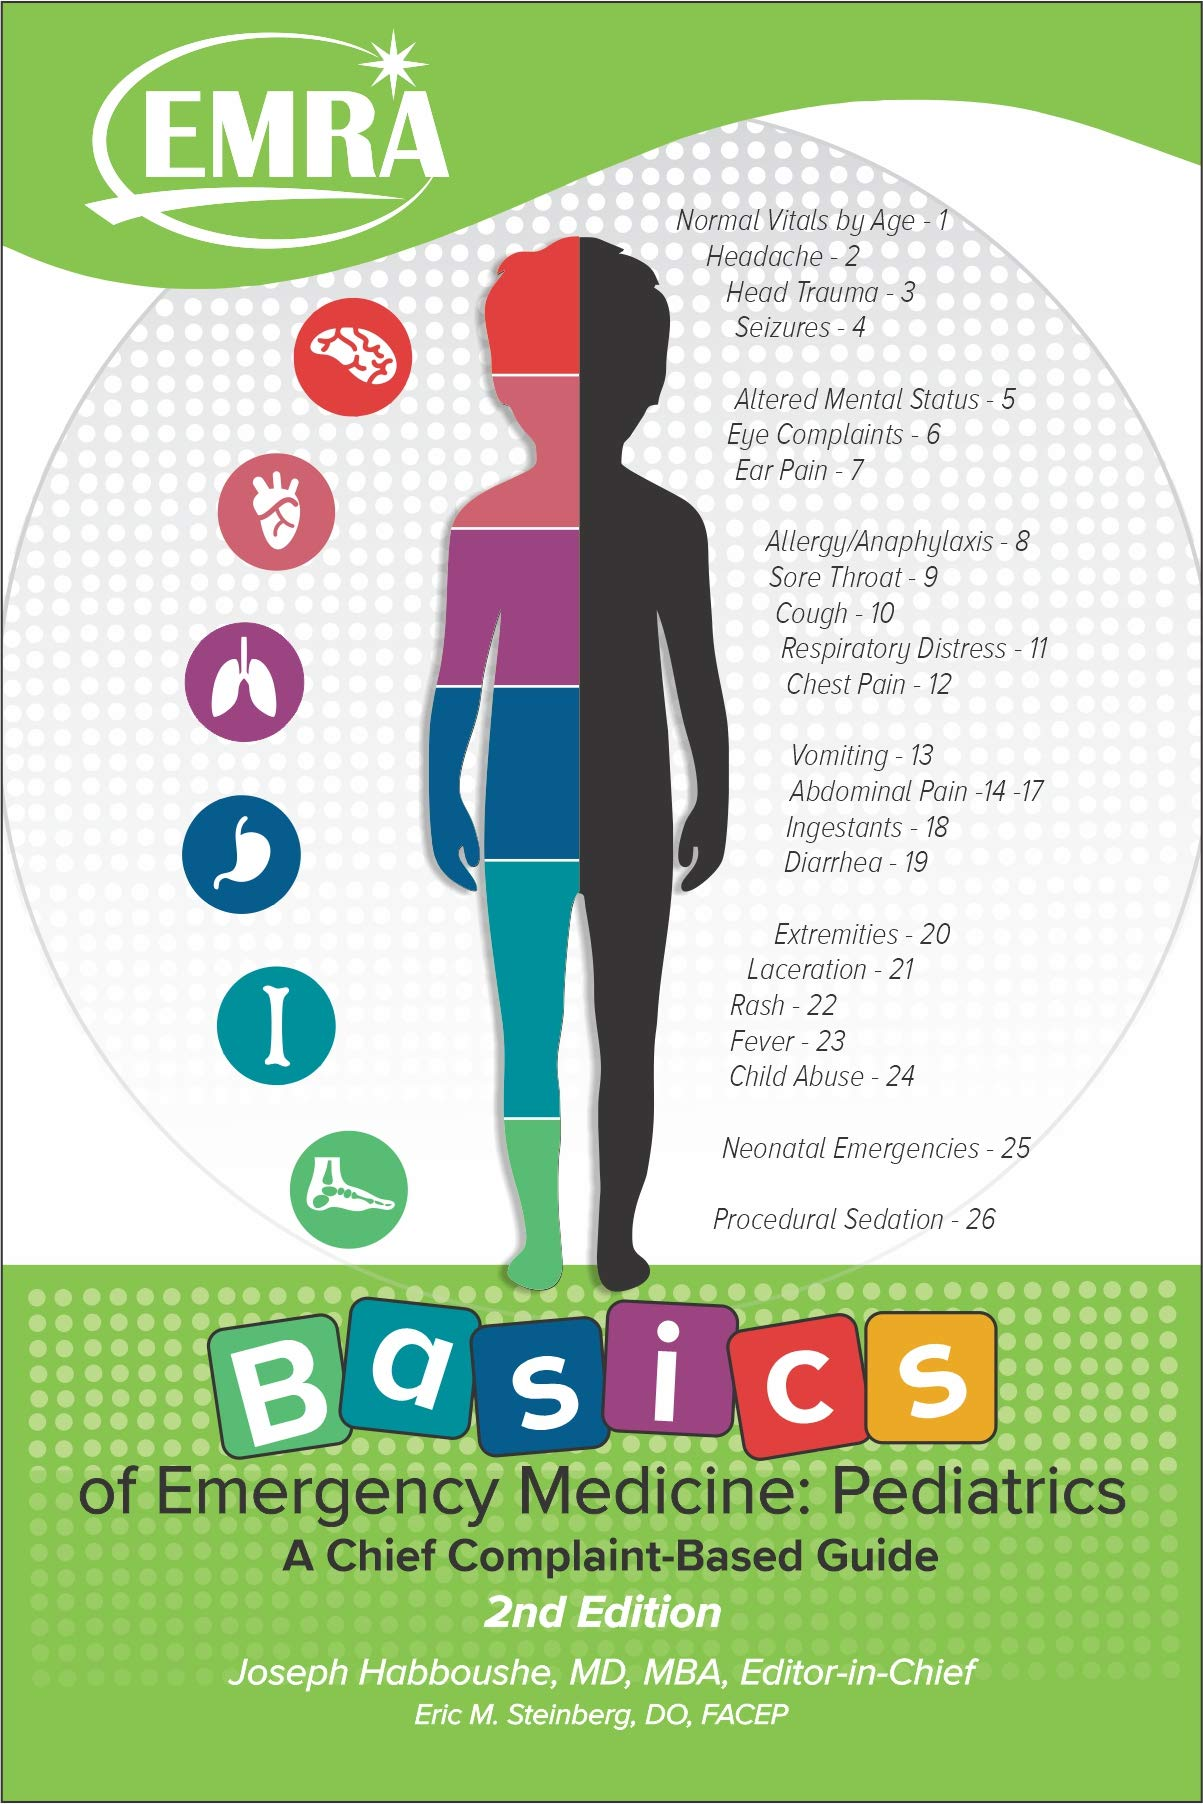 Basics of Emergency Medicine: Pediatrics, 2nd Ed.